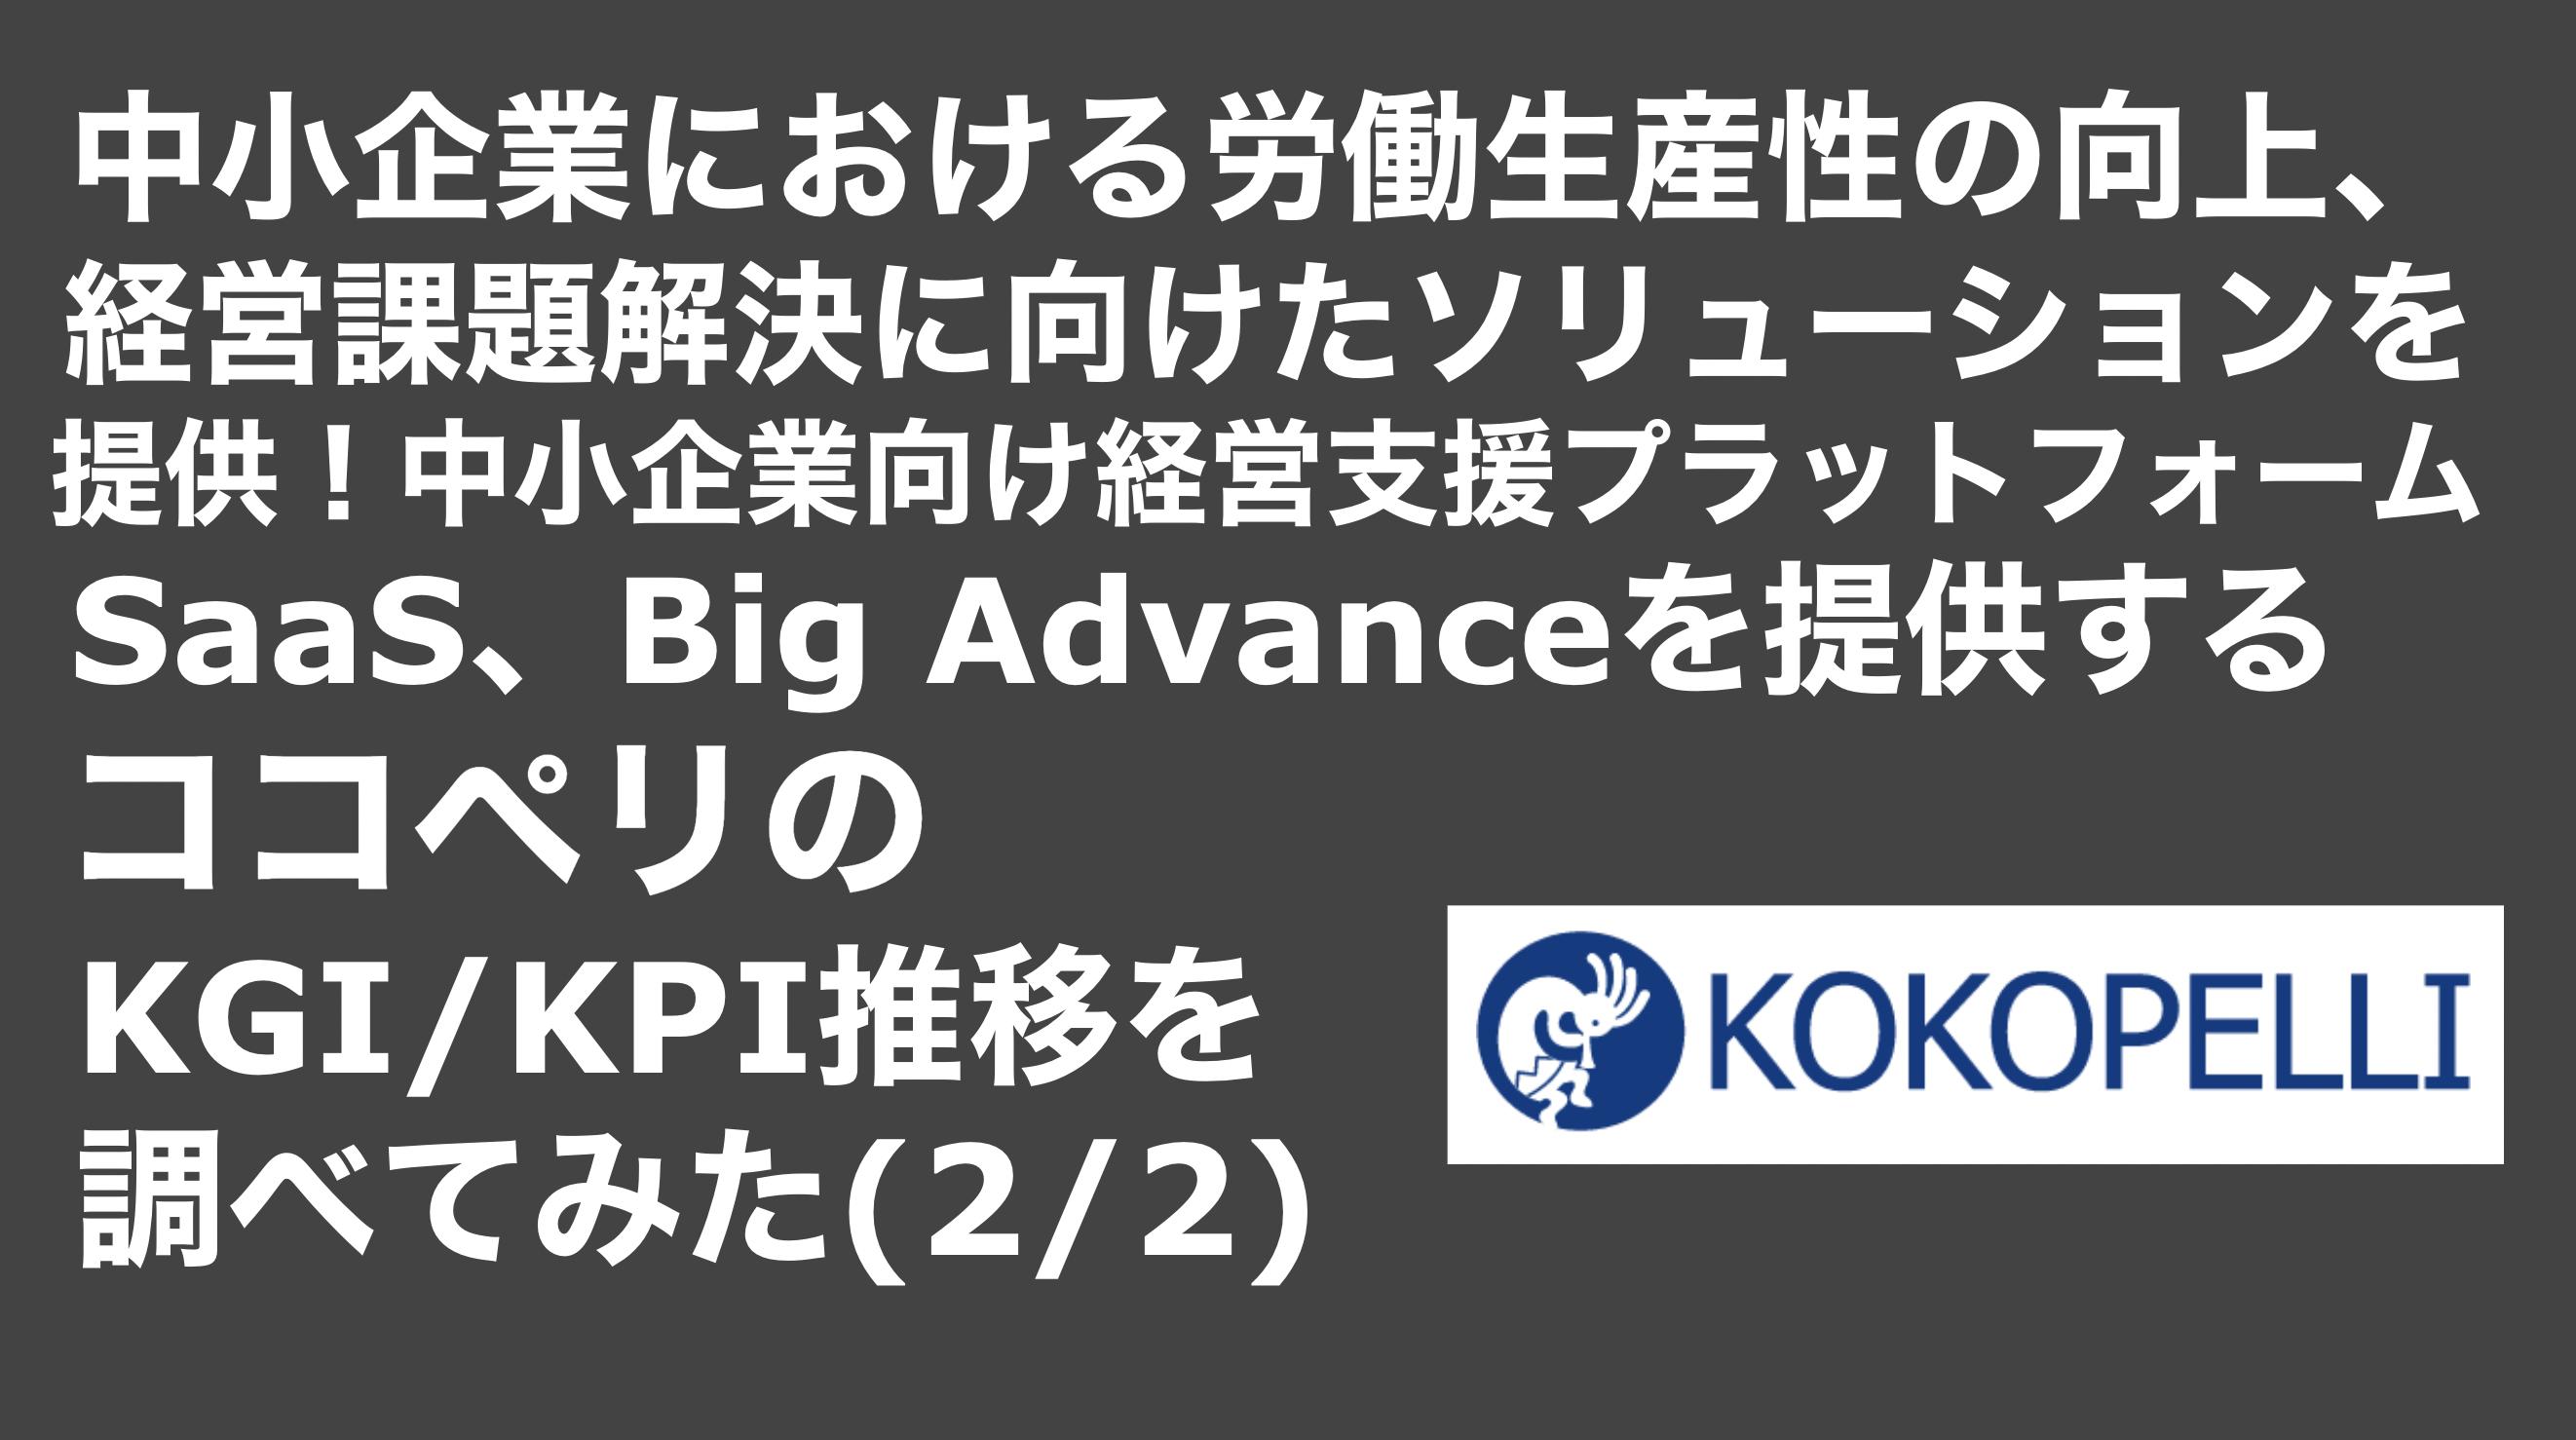 saaslife_中小企業における労働生産性の向上、経営課題解決に向けたソリューションを提供!中小企業向け経営支援プラットフォームSaaS、Big Advanceを提供するココペリのKGI/KPI推移を調べてみた(2/2)